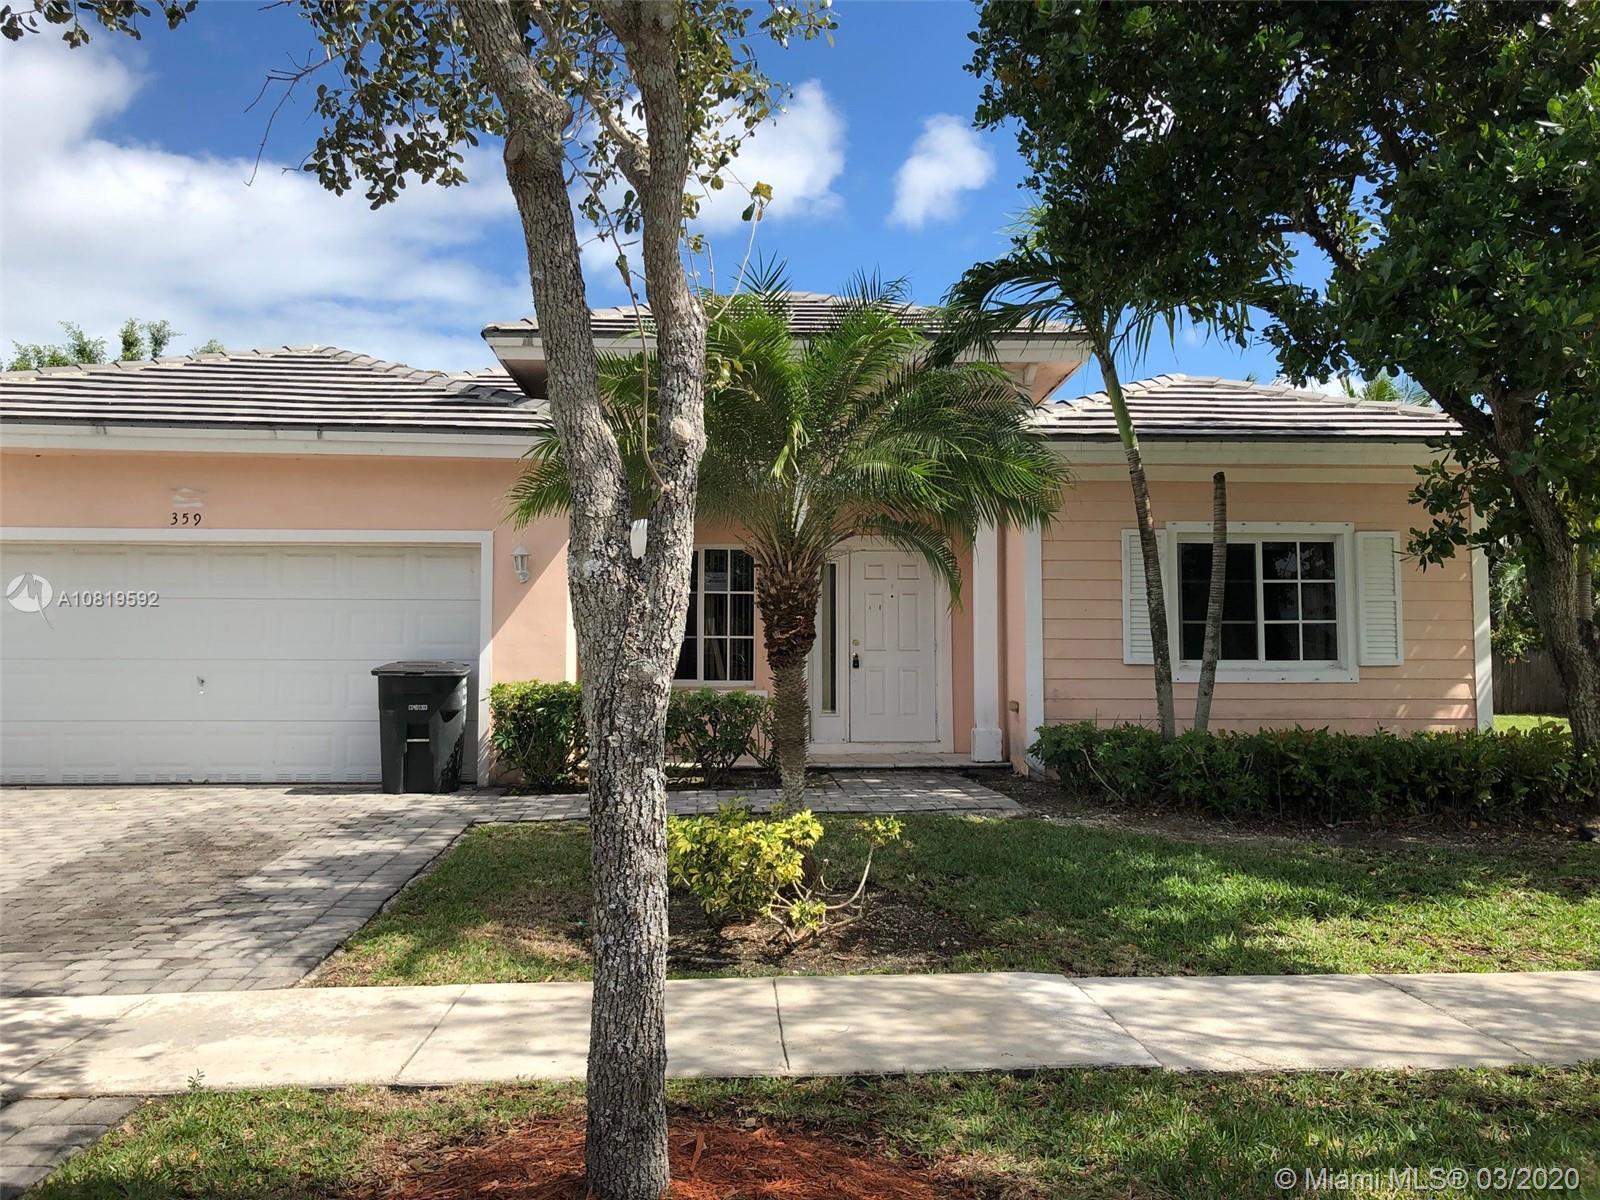 359 NE 29th Ave, Homestead, FL 33033 - Homestead, FL real estate listing